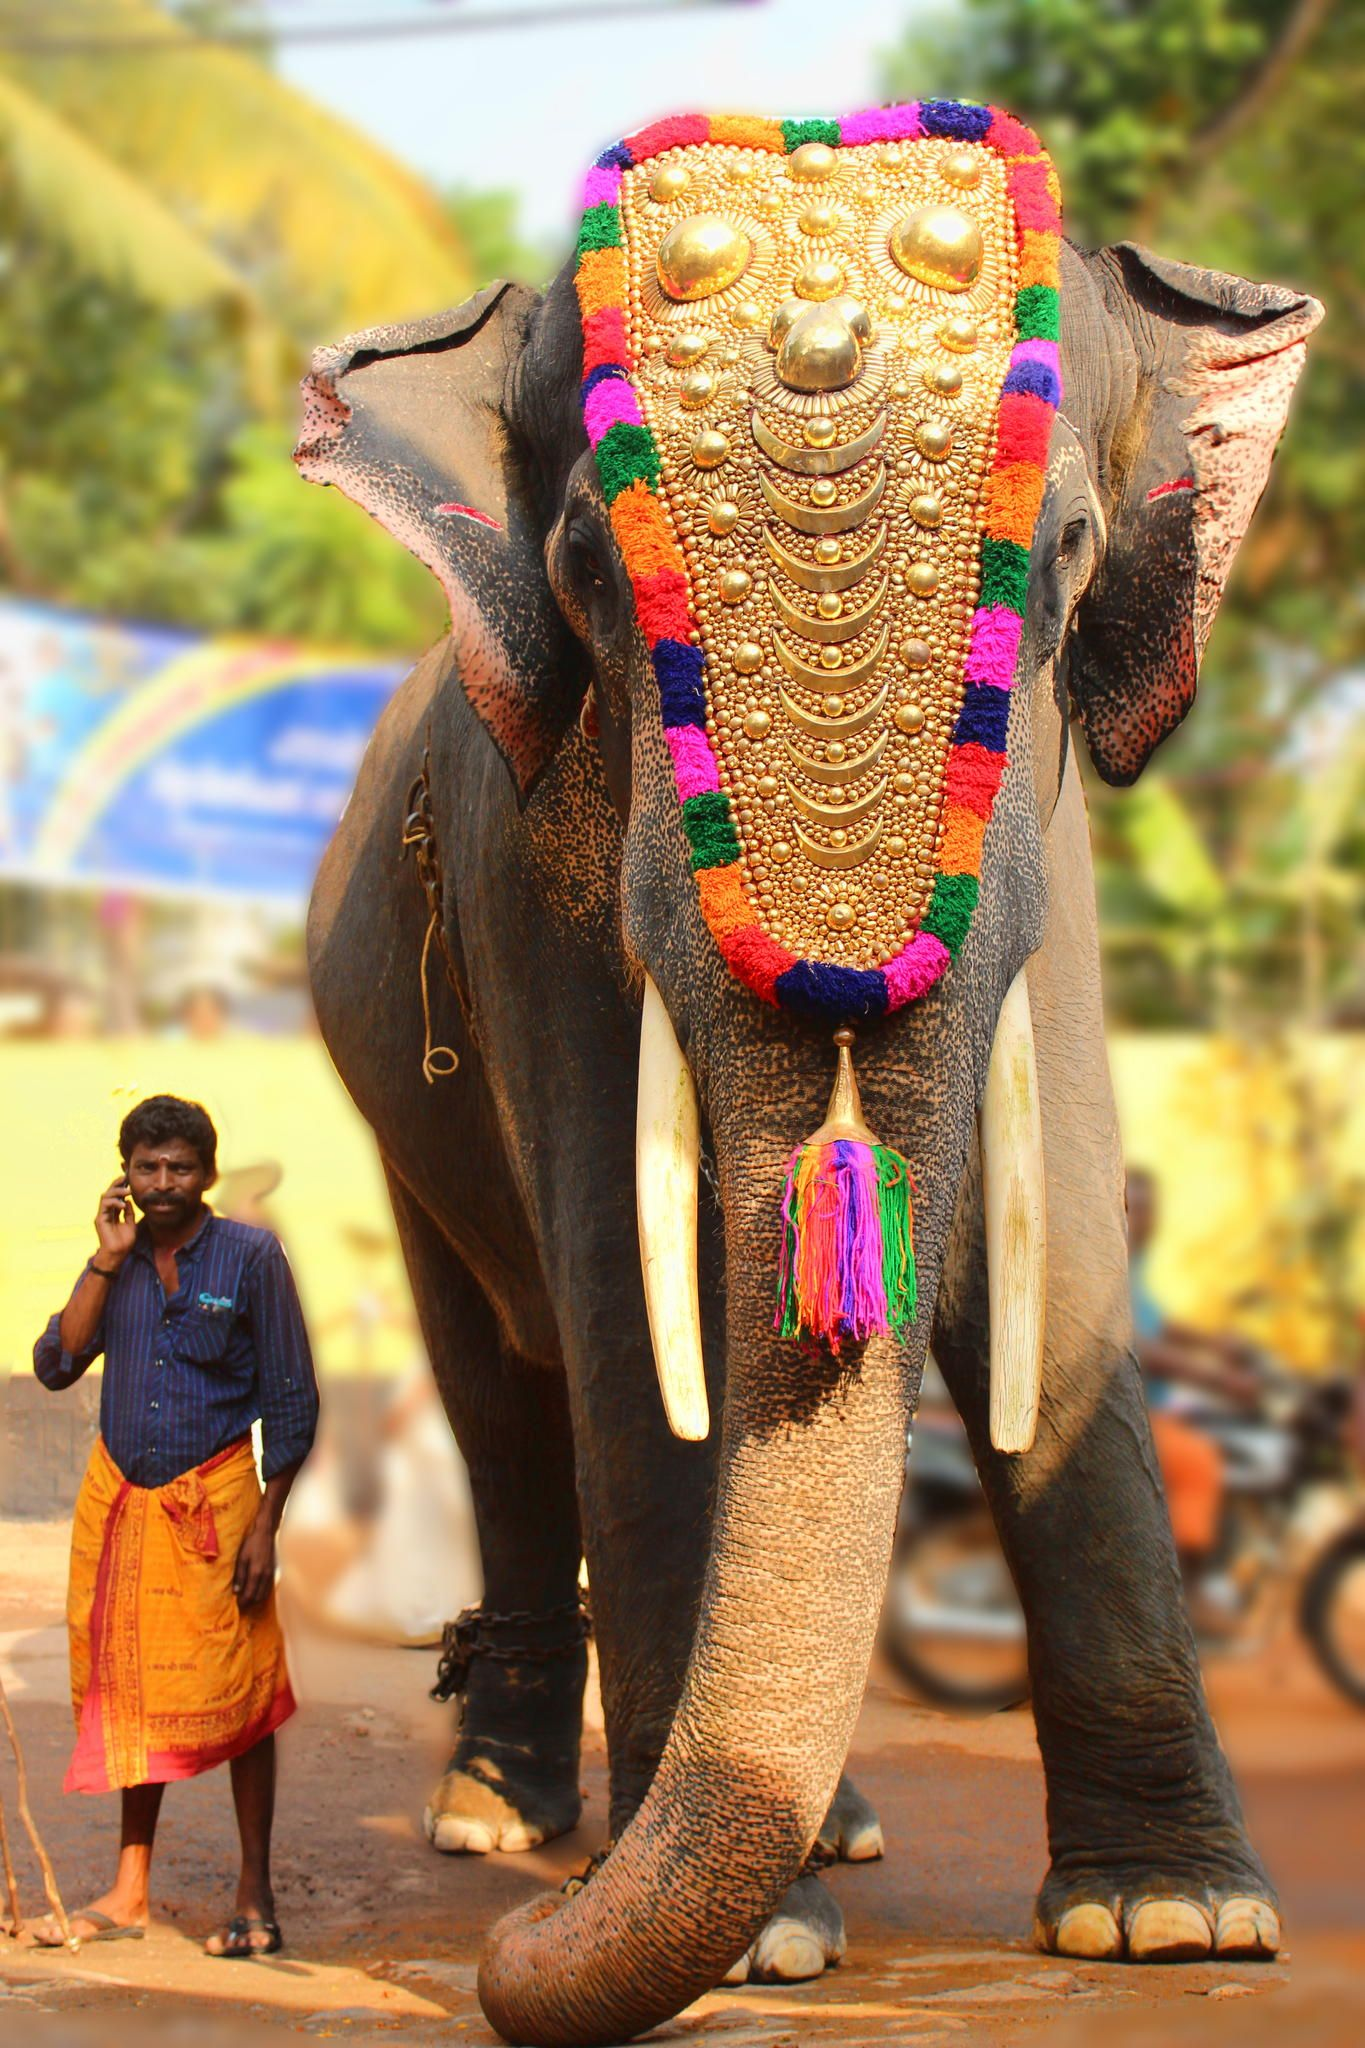 Festival in Kerala, India india Pinterest Kerala